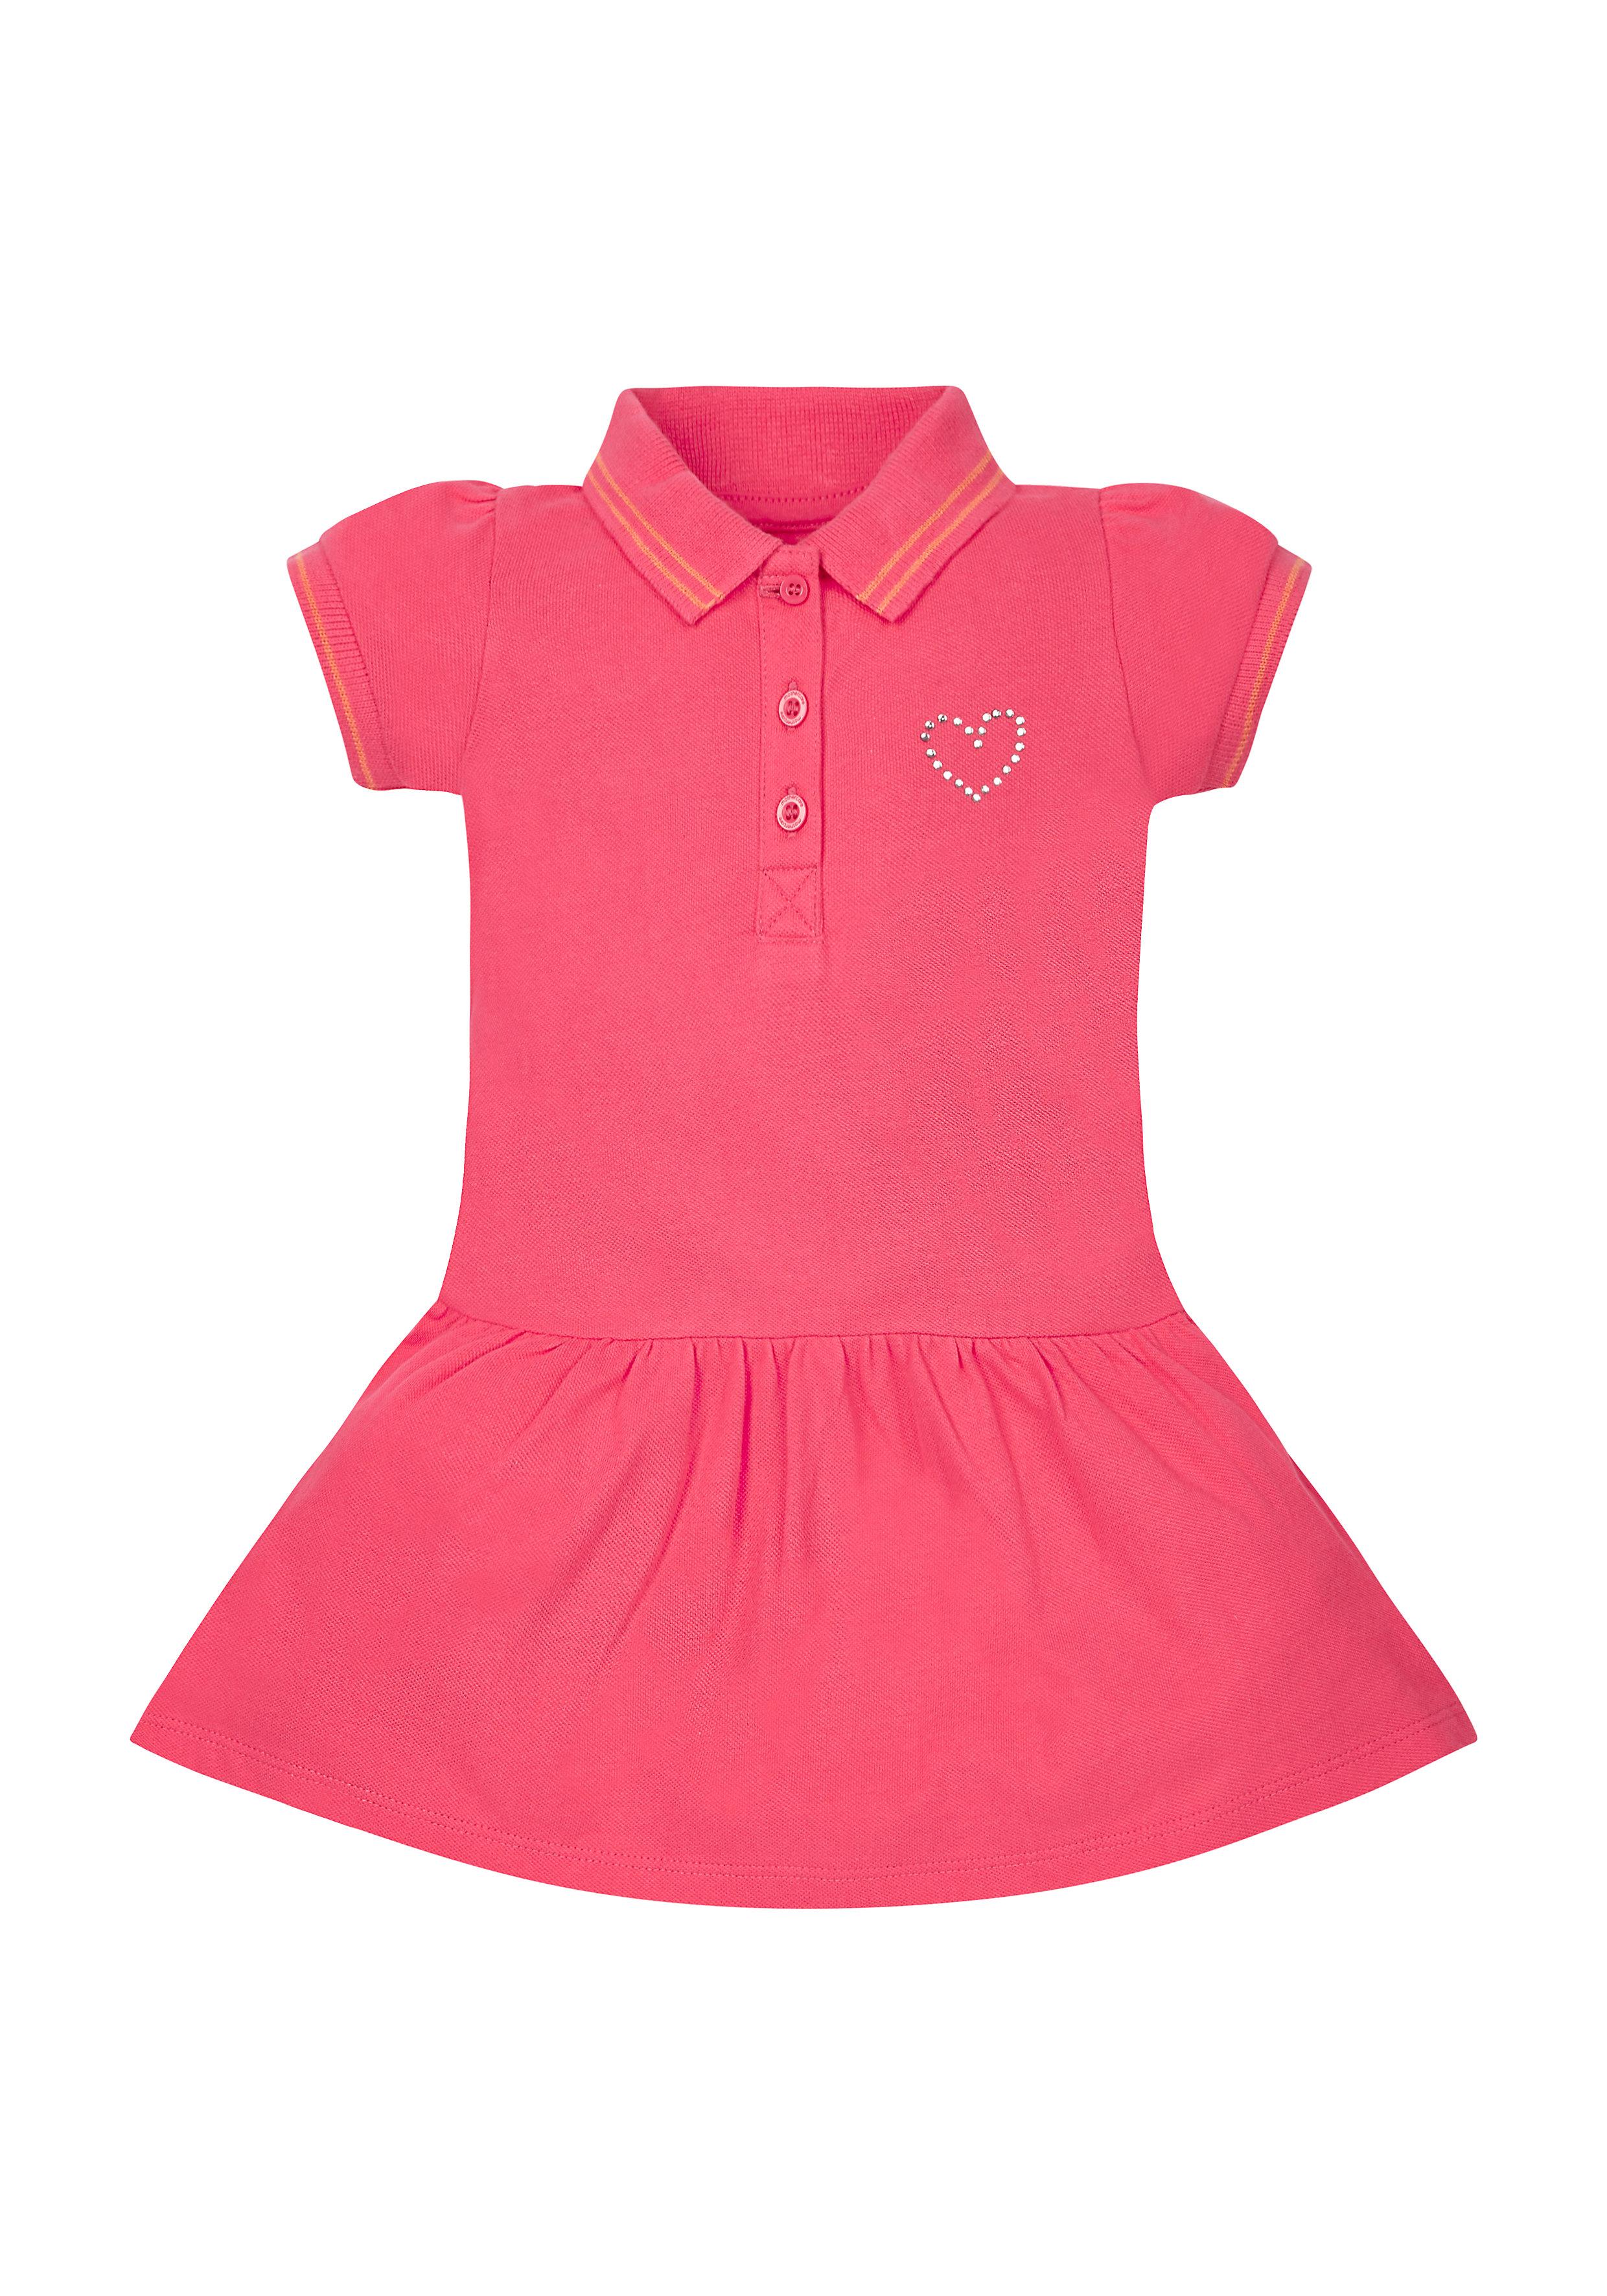 Mothercare | Girls Pique Polo Dress - Pink